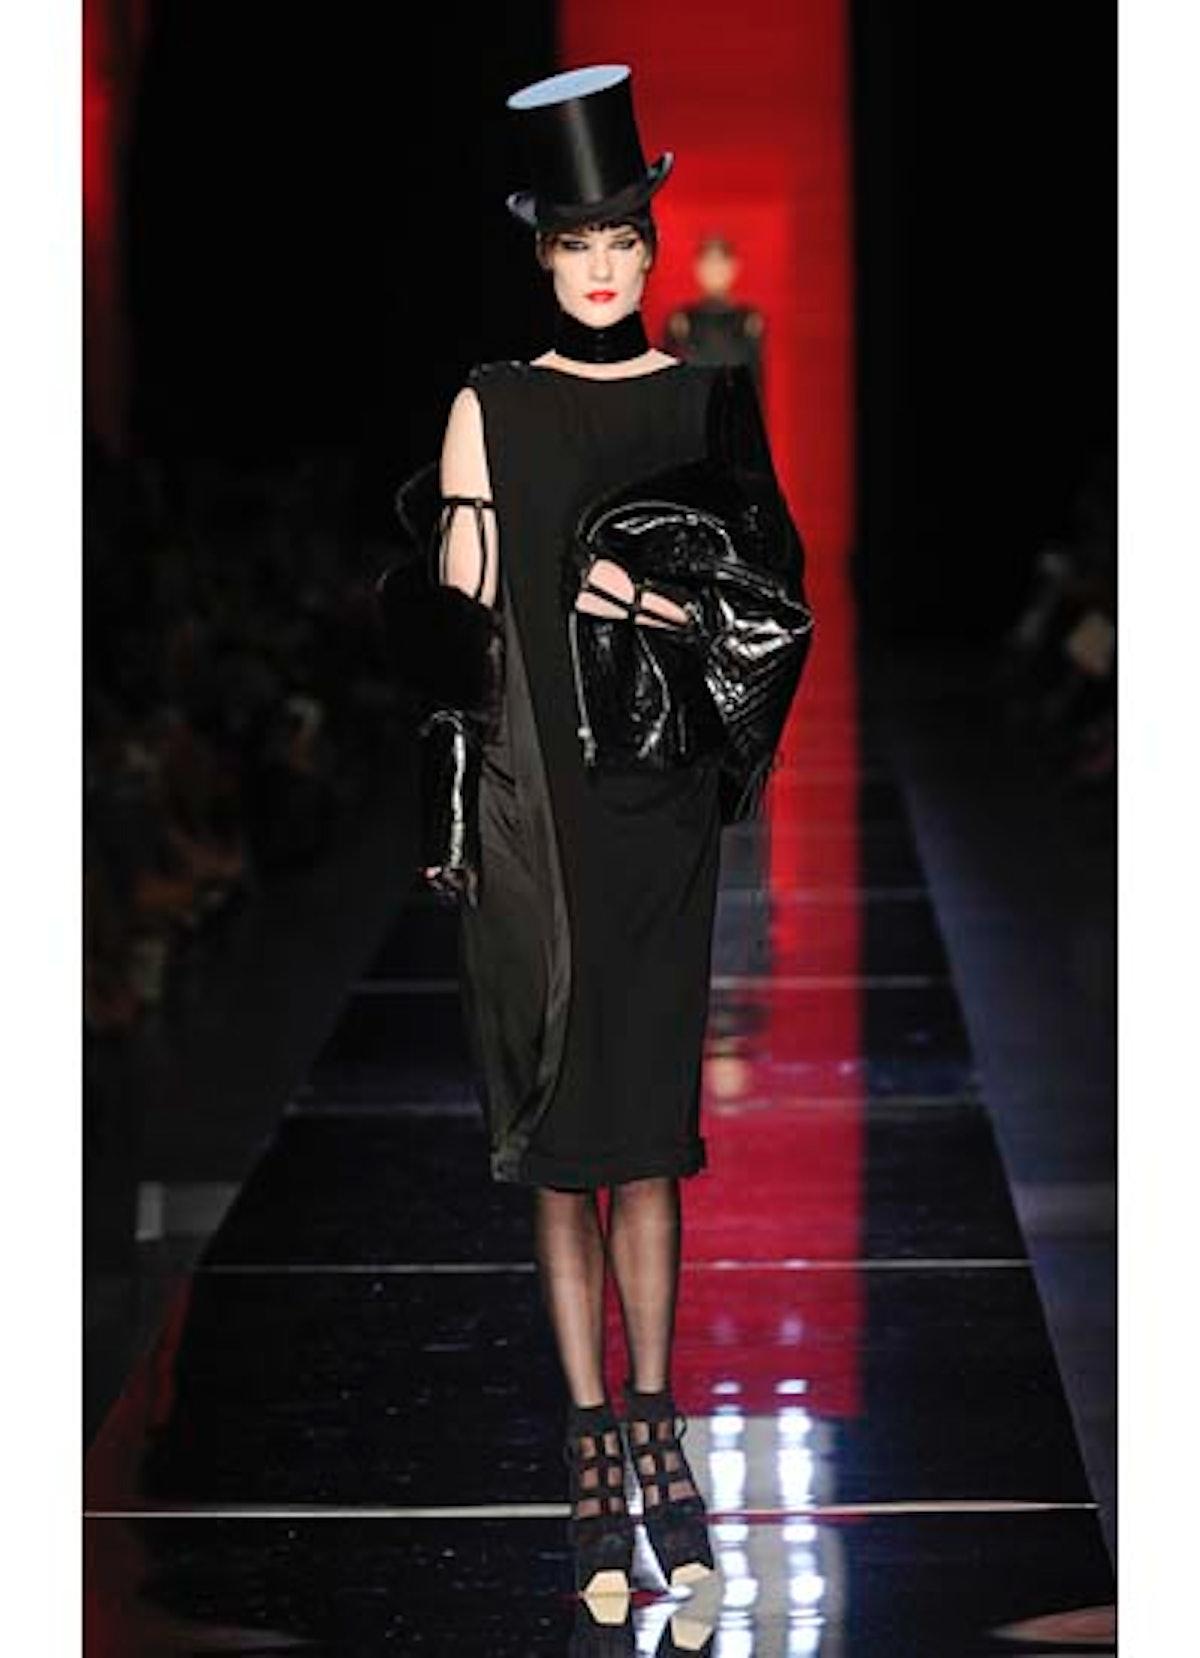 fass-jean-paul-gaultier-couture-2012-runway-14-v.jpg